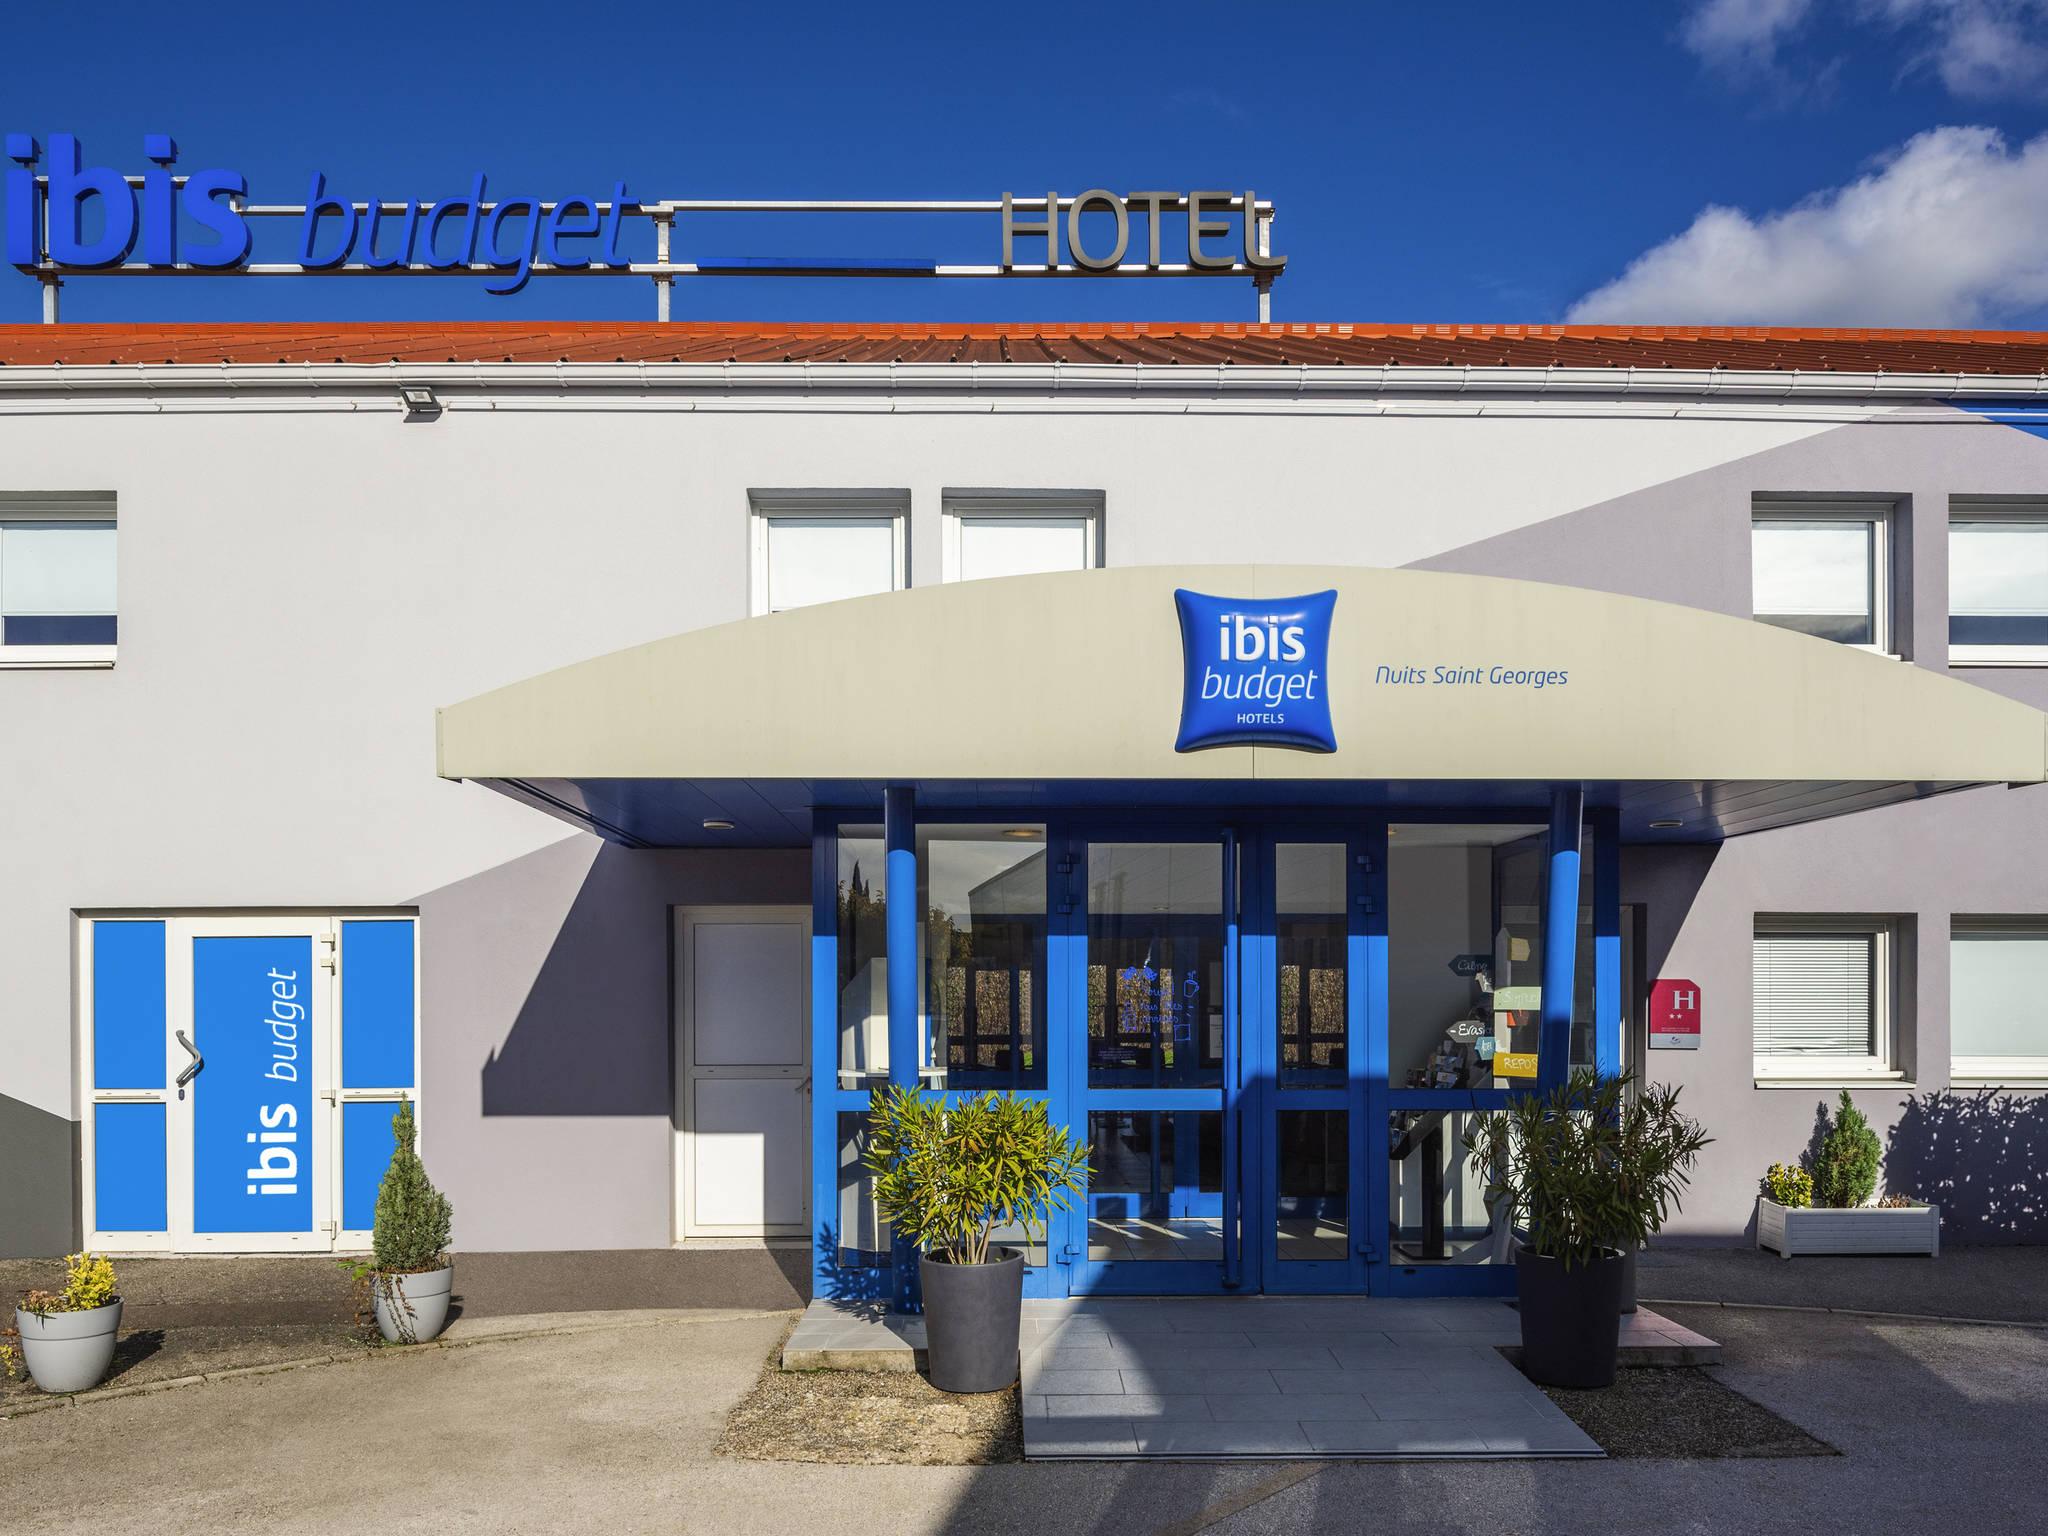 Hotel – ibis budget Nuits Saint Georges